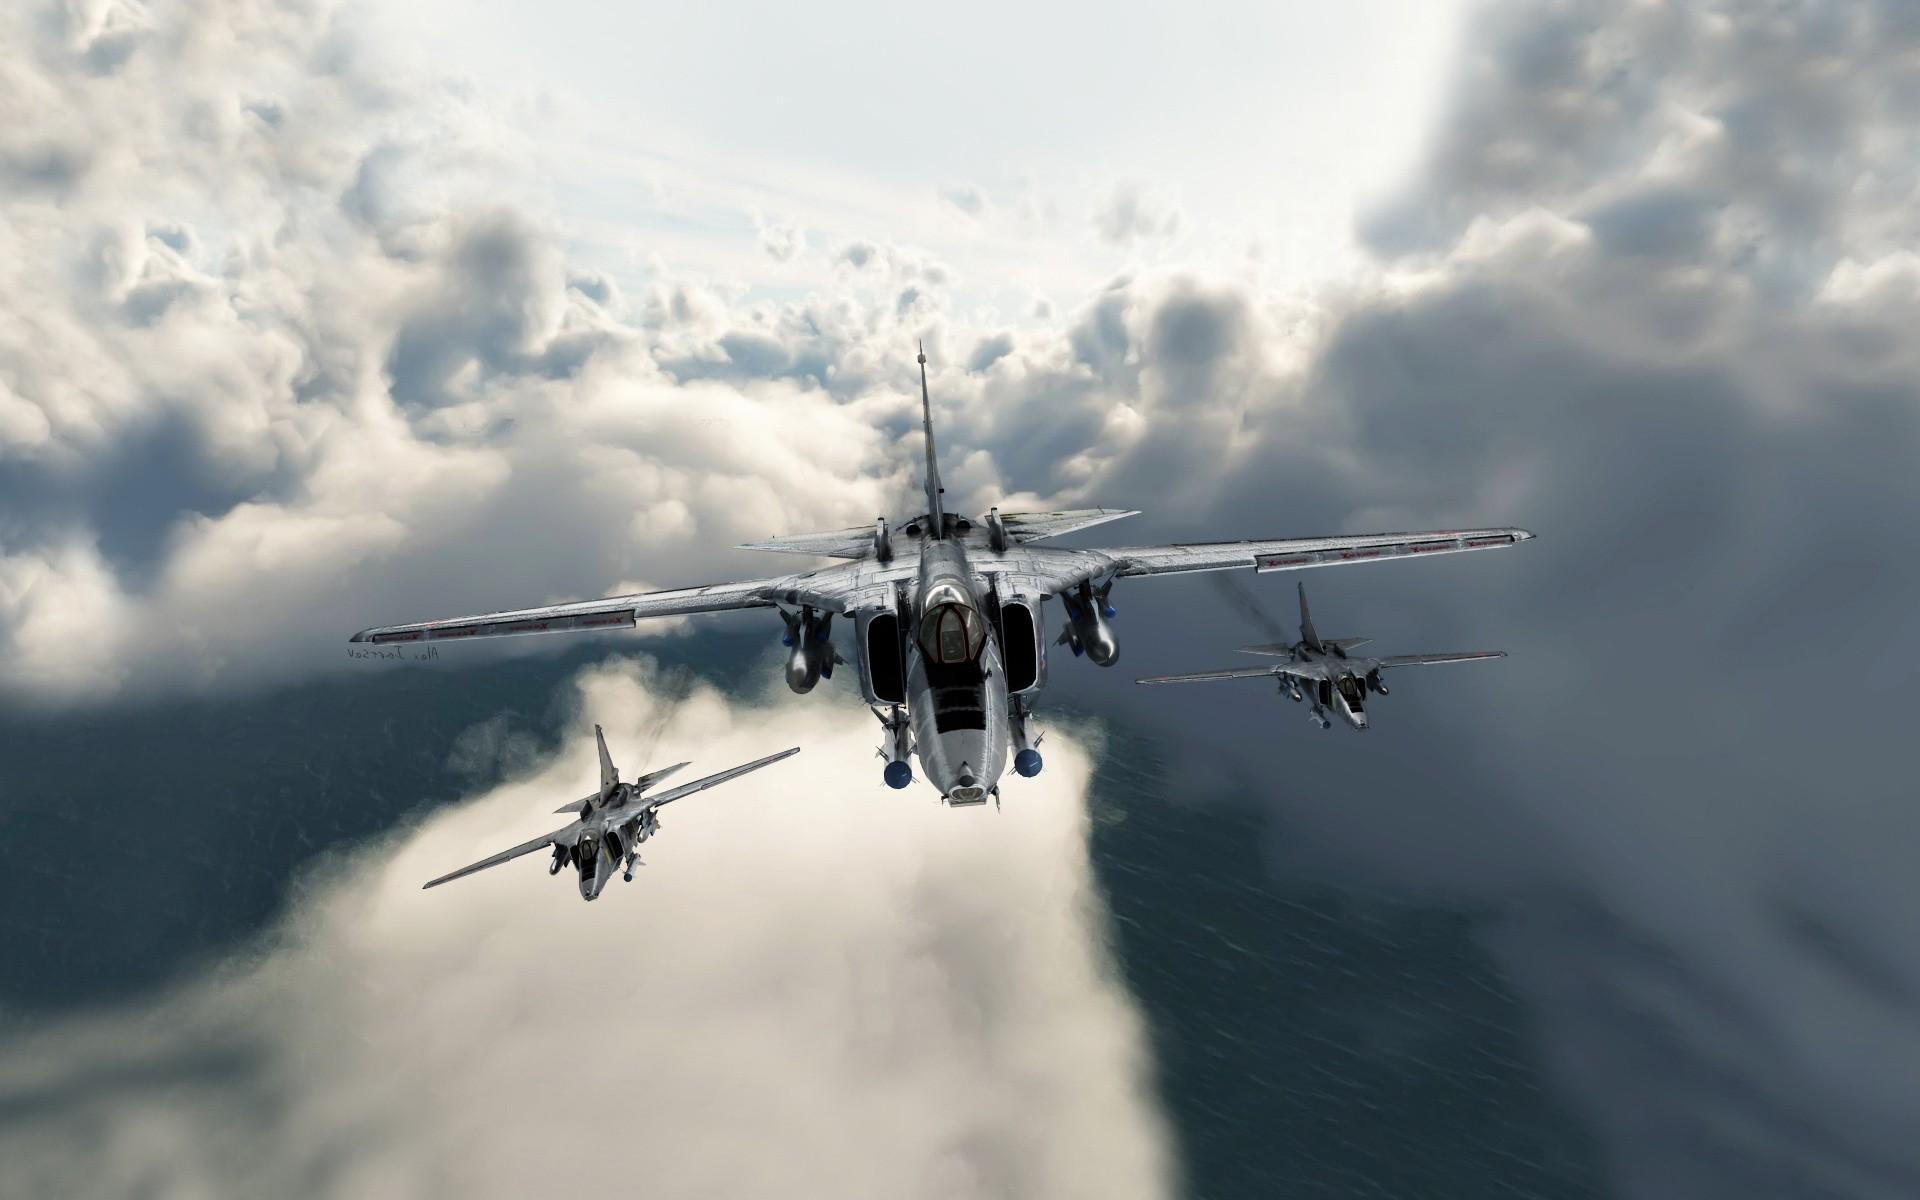 Military aircraft wallpaper 59 images - Jet wallpaper ...